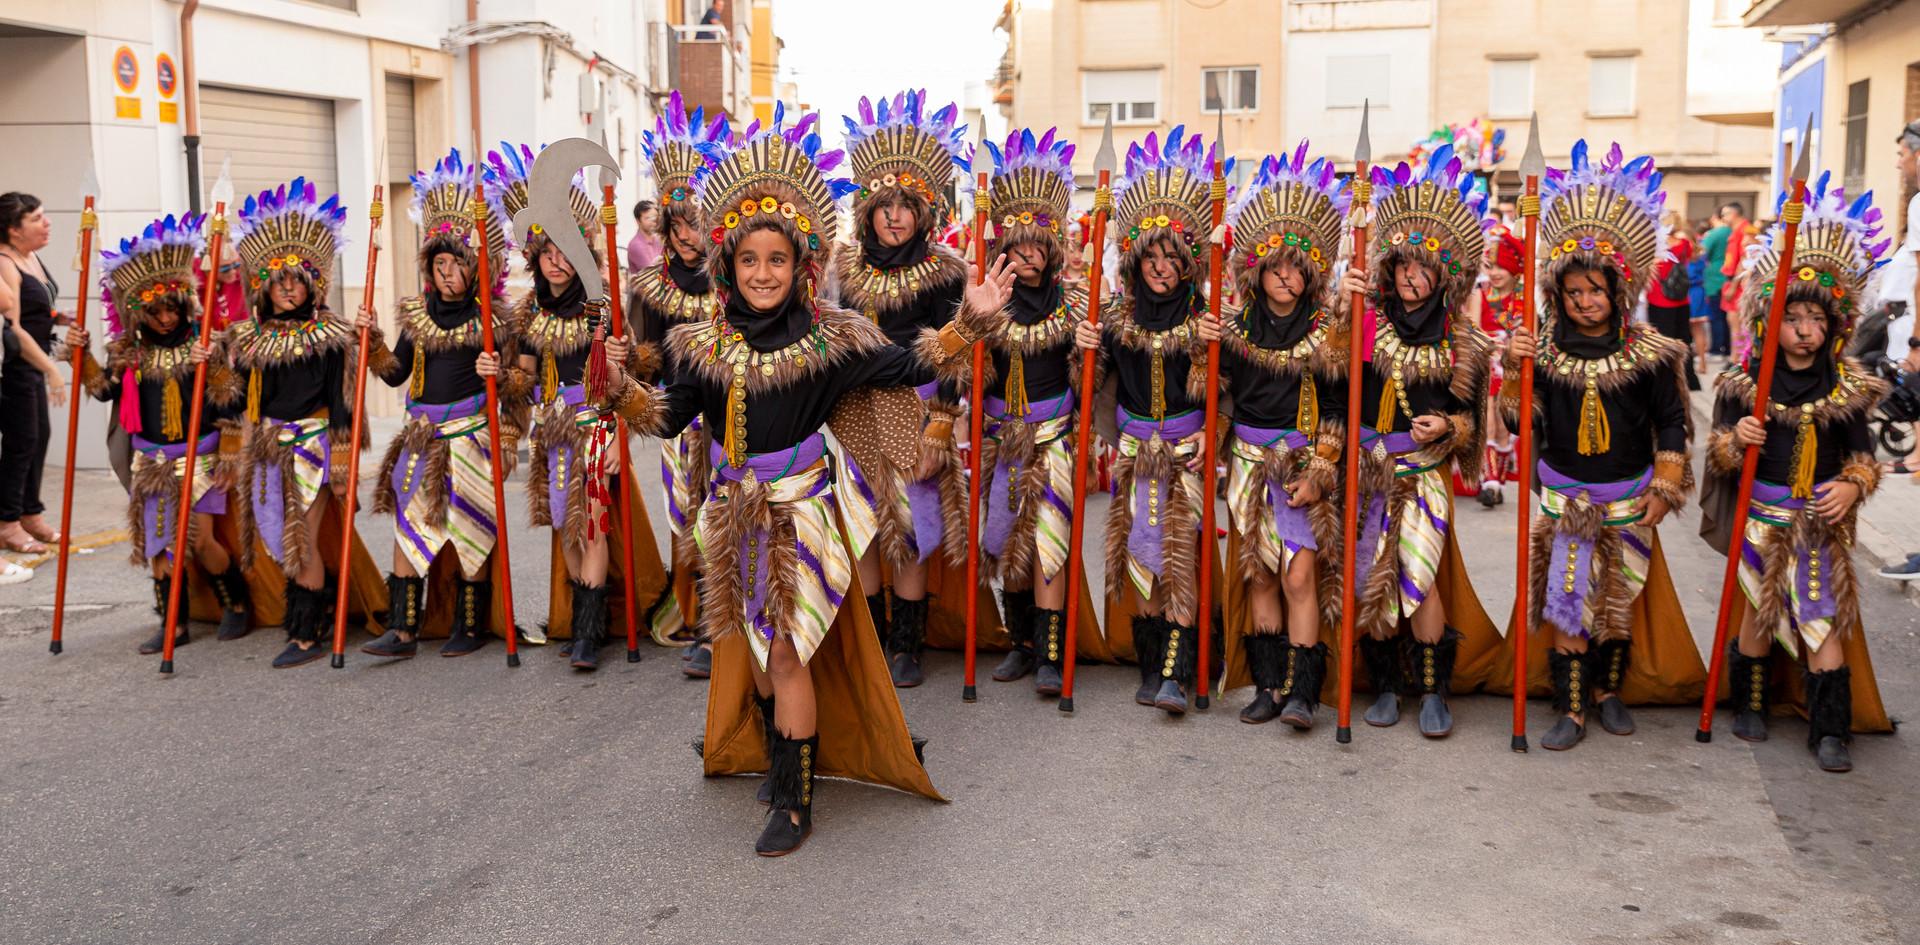 Desfilada infantil. Alaçdrach 2019